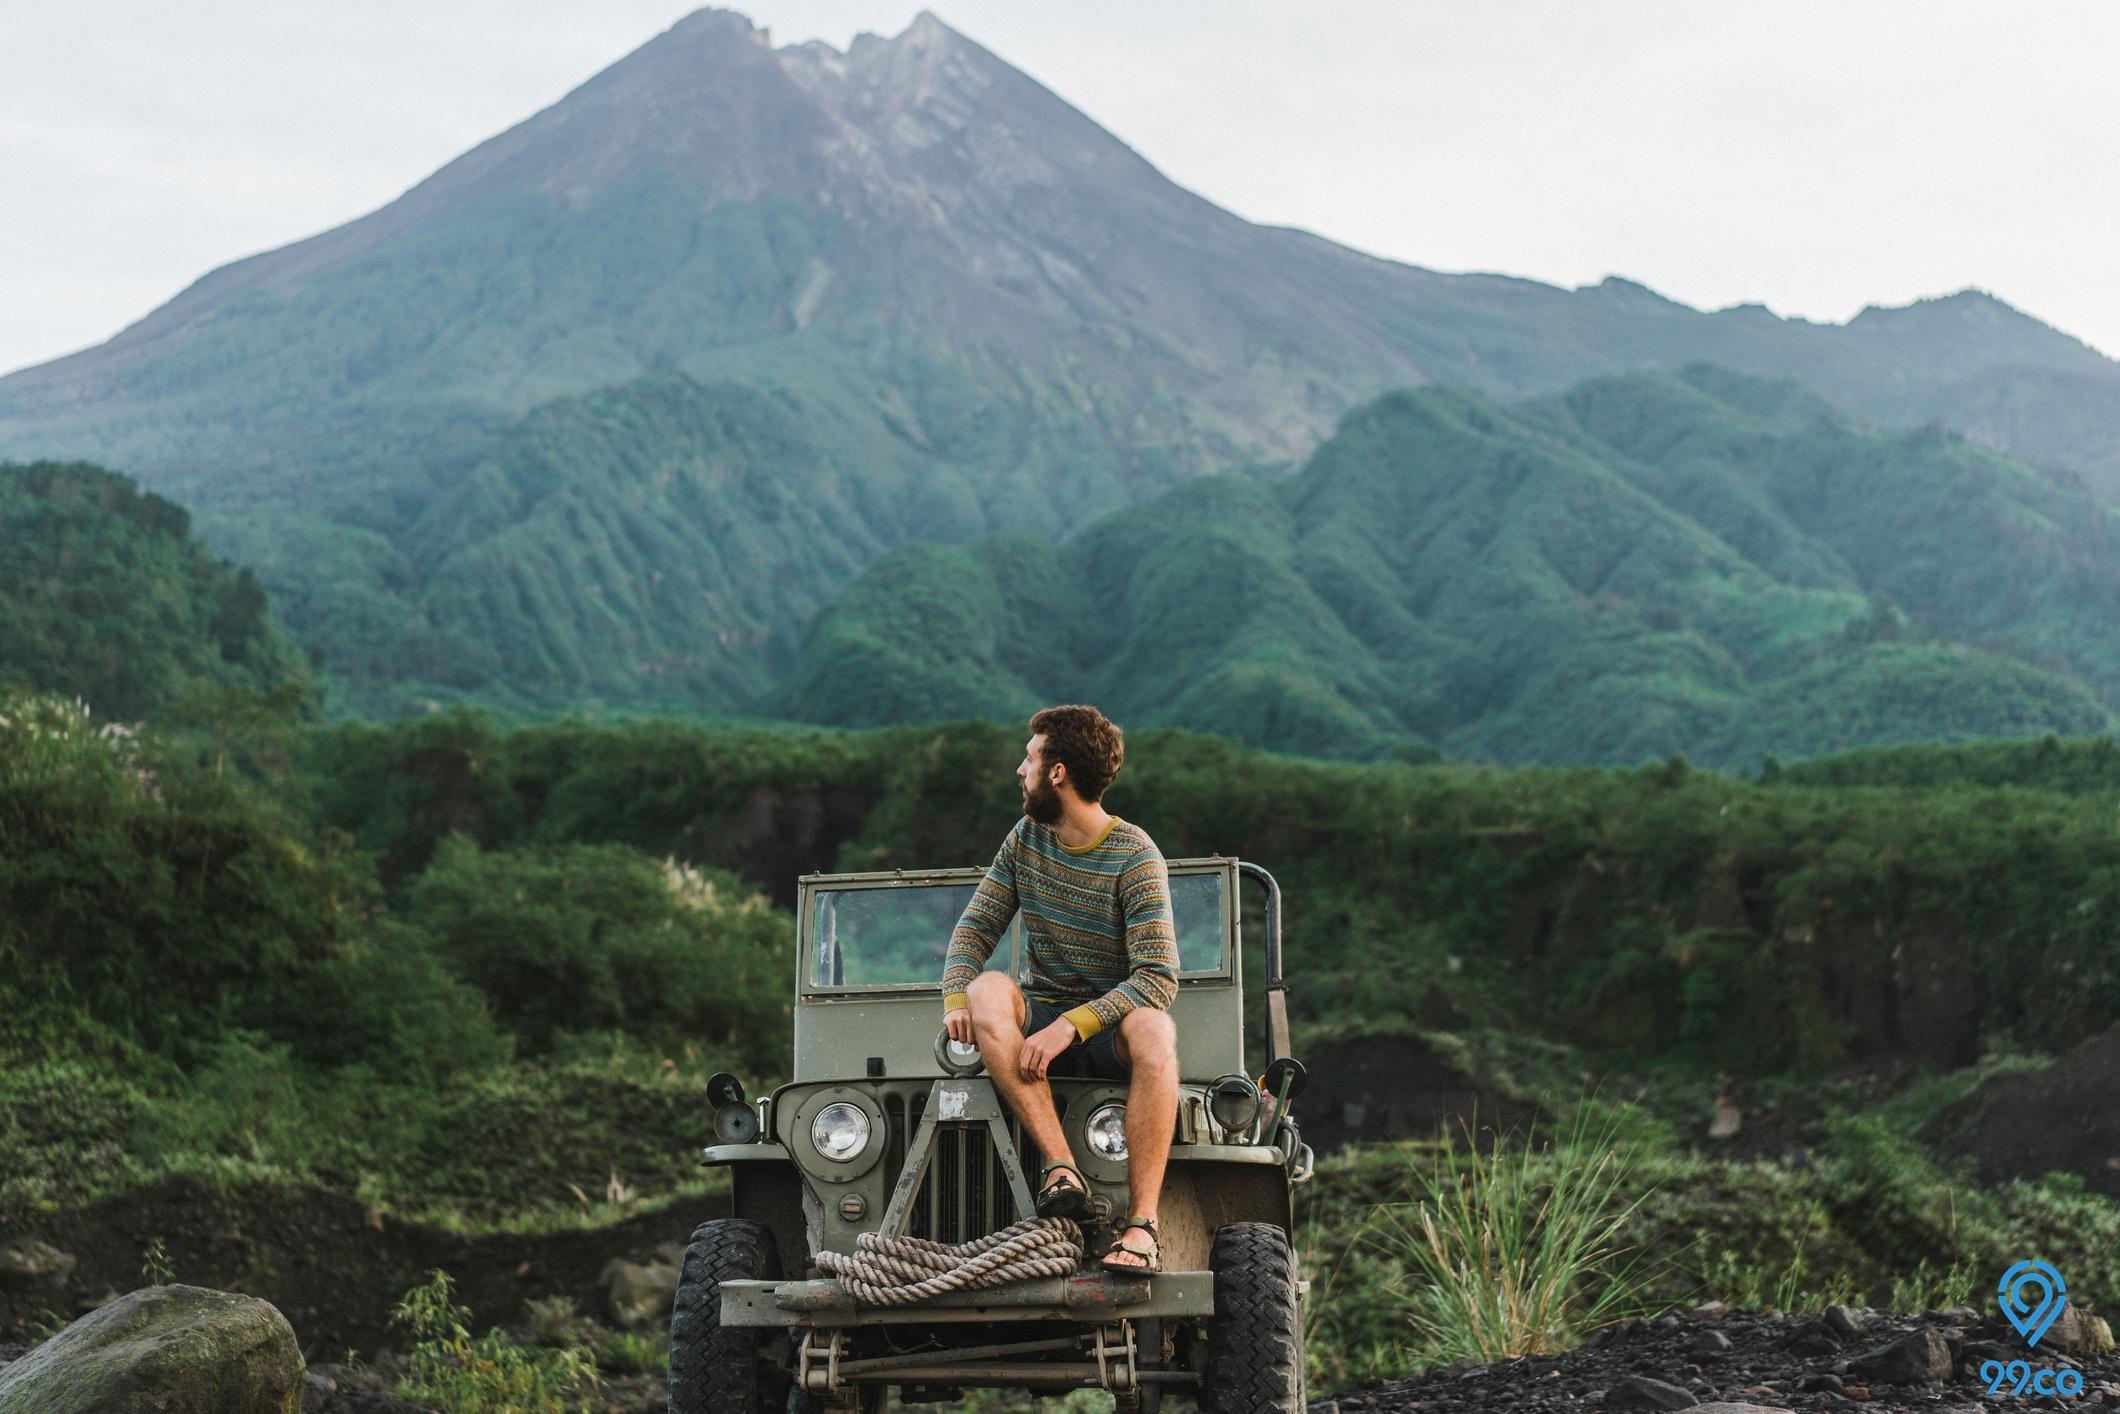 5 Tempat Wisata Alam Yogyakarta Yang Wajib Dikunjungi